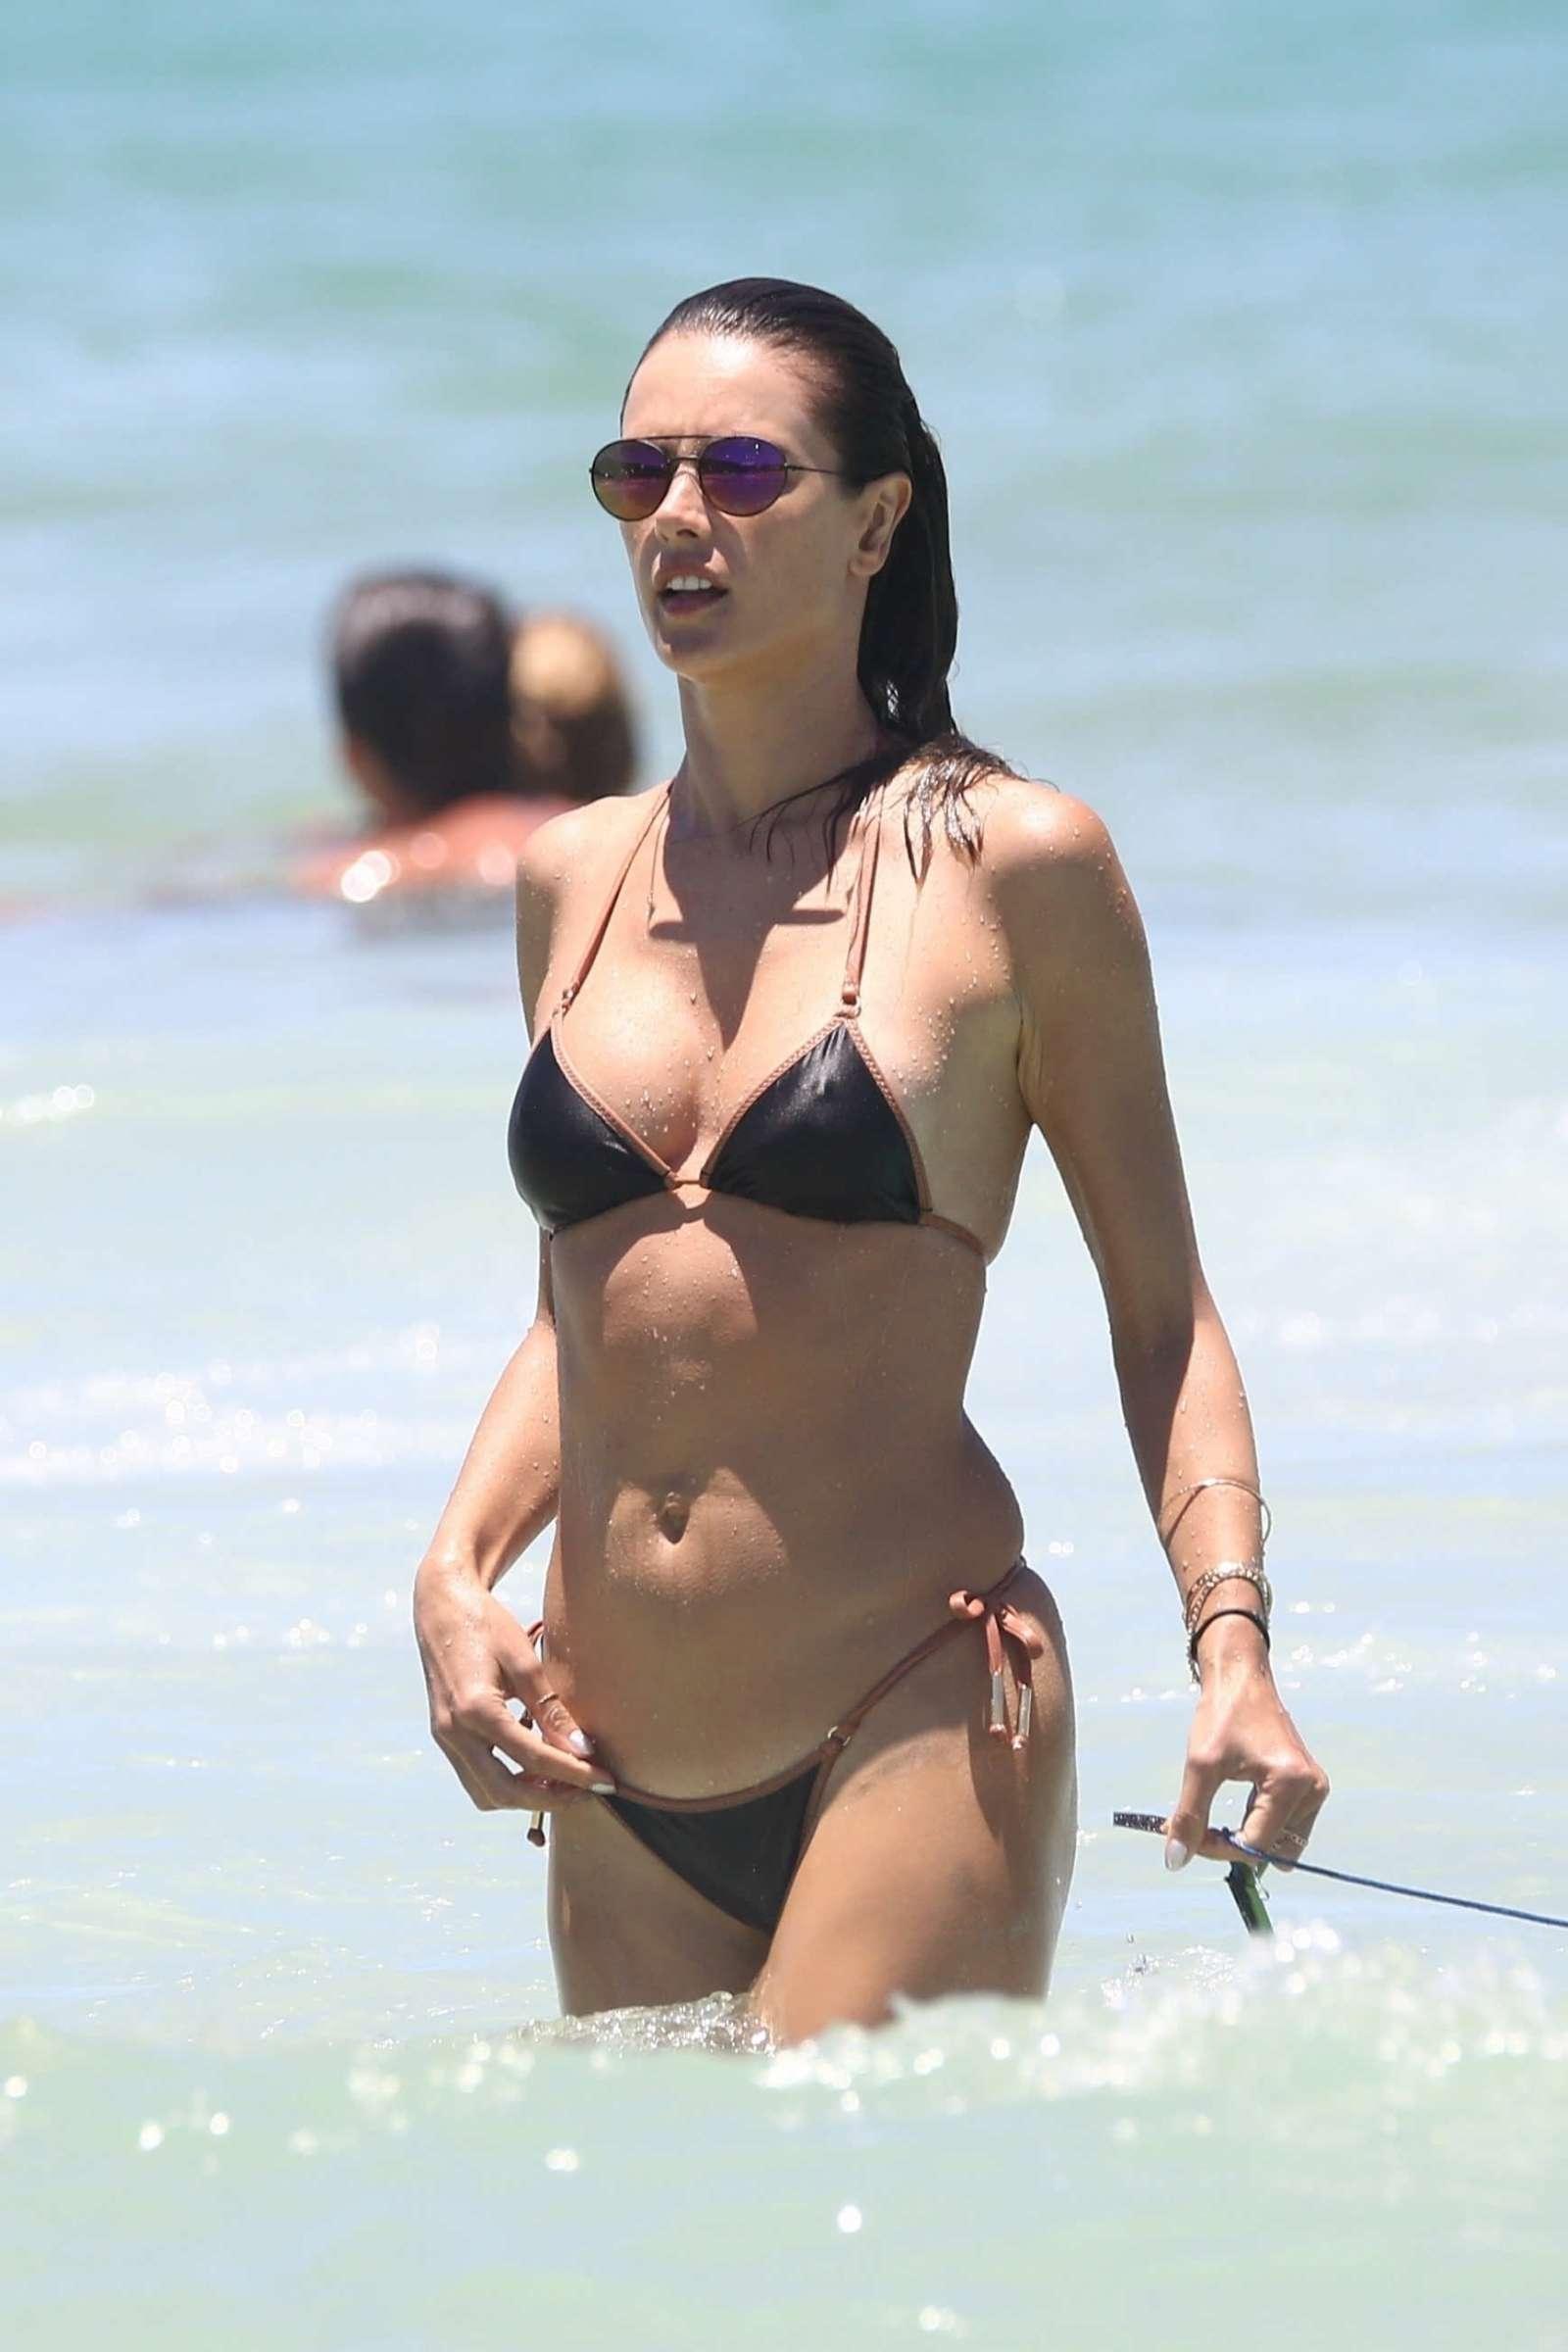 Alessandra Ambrosio in Black Bikini on the beach in Brazil